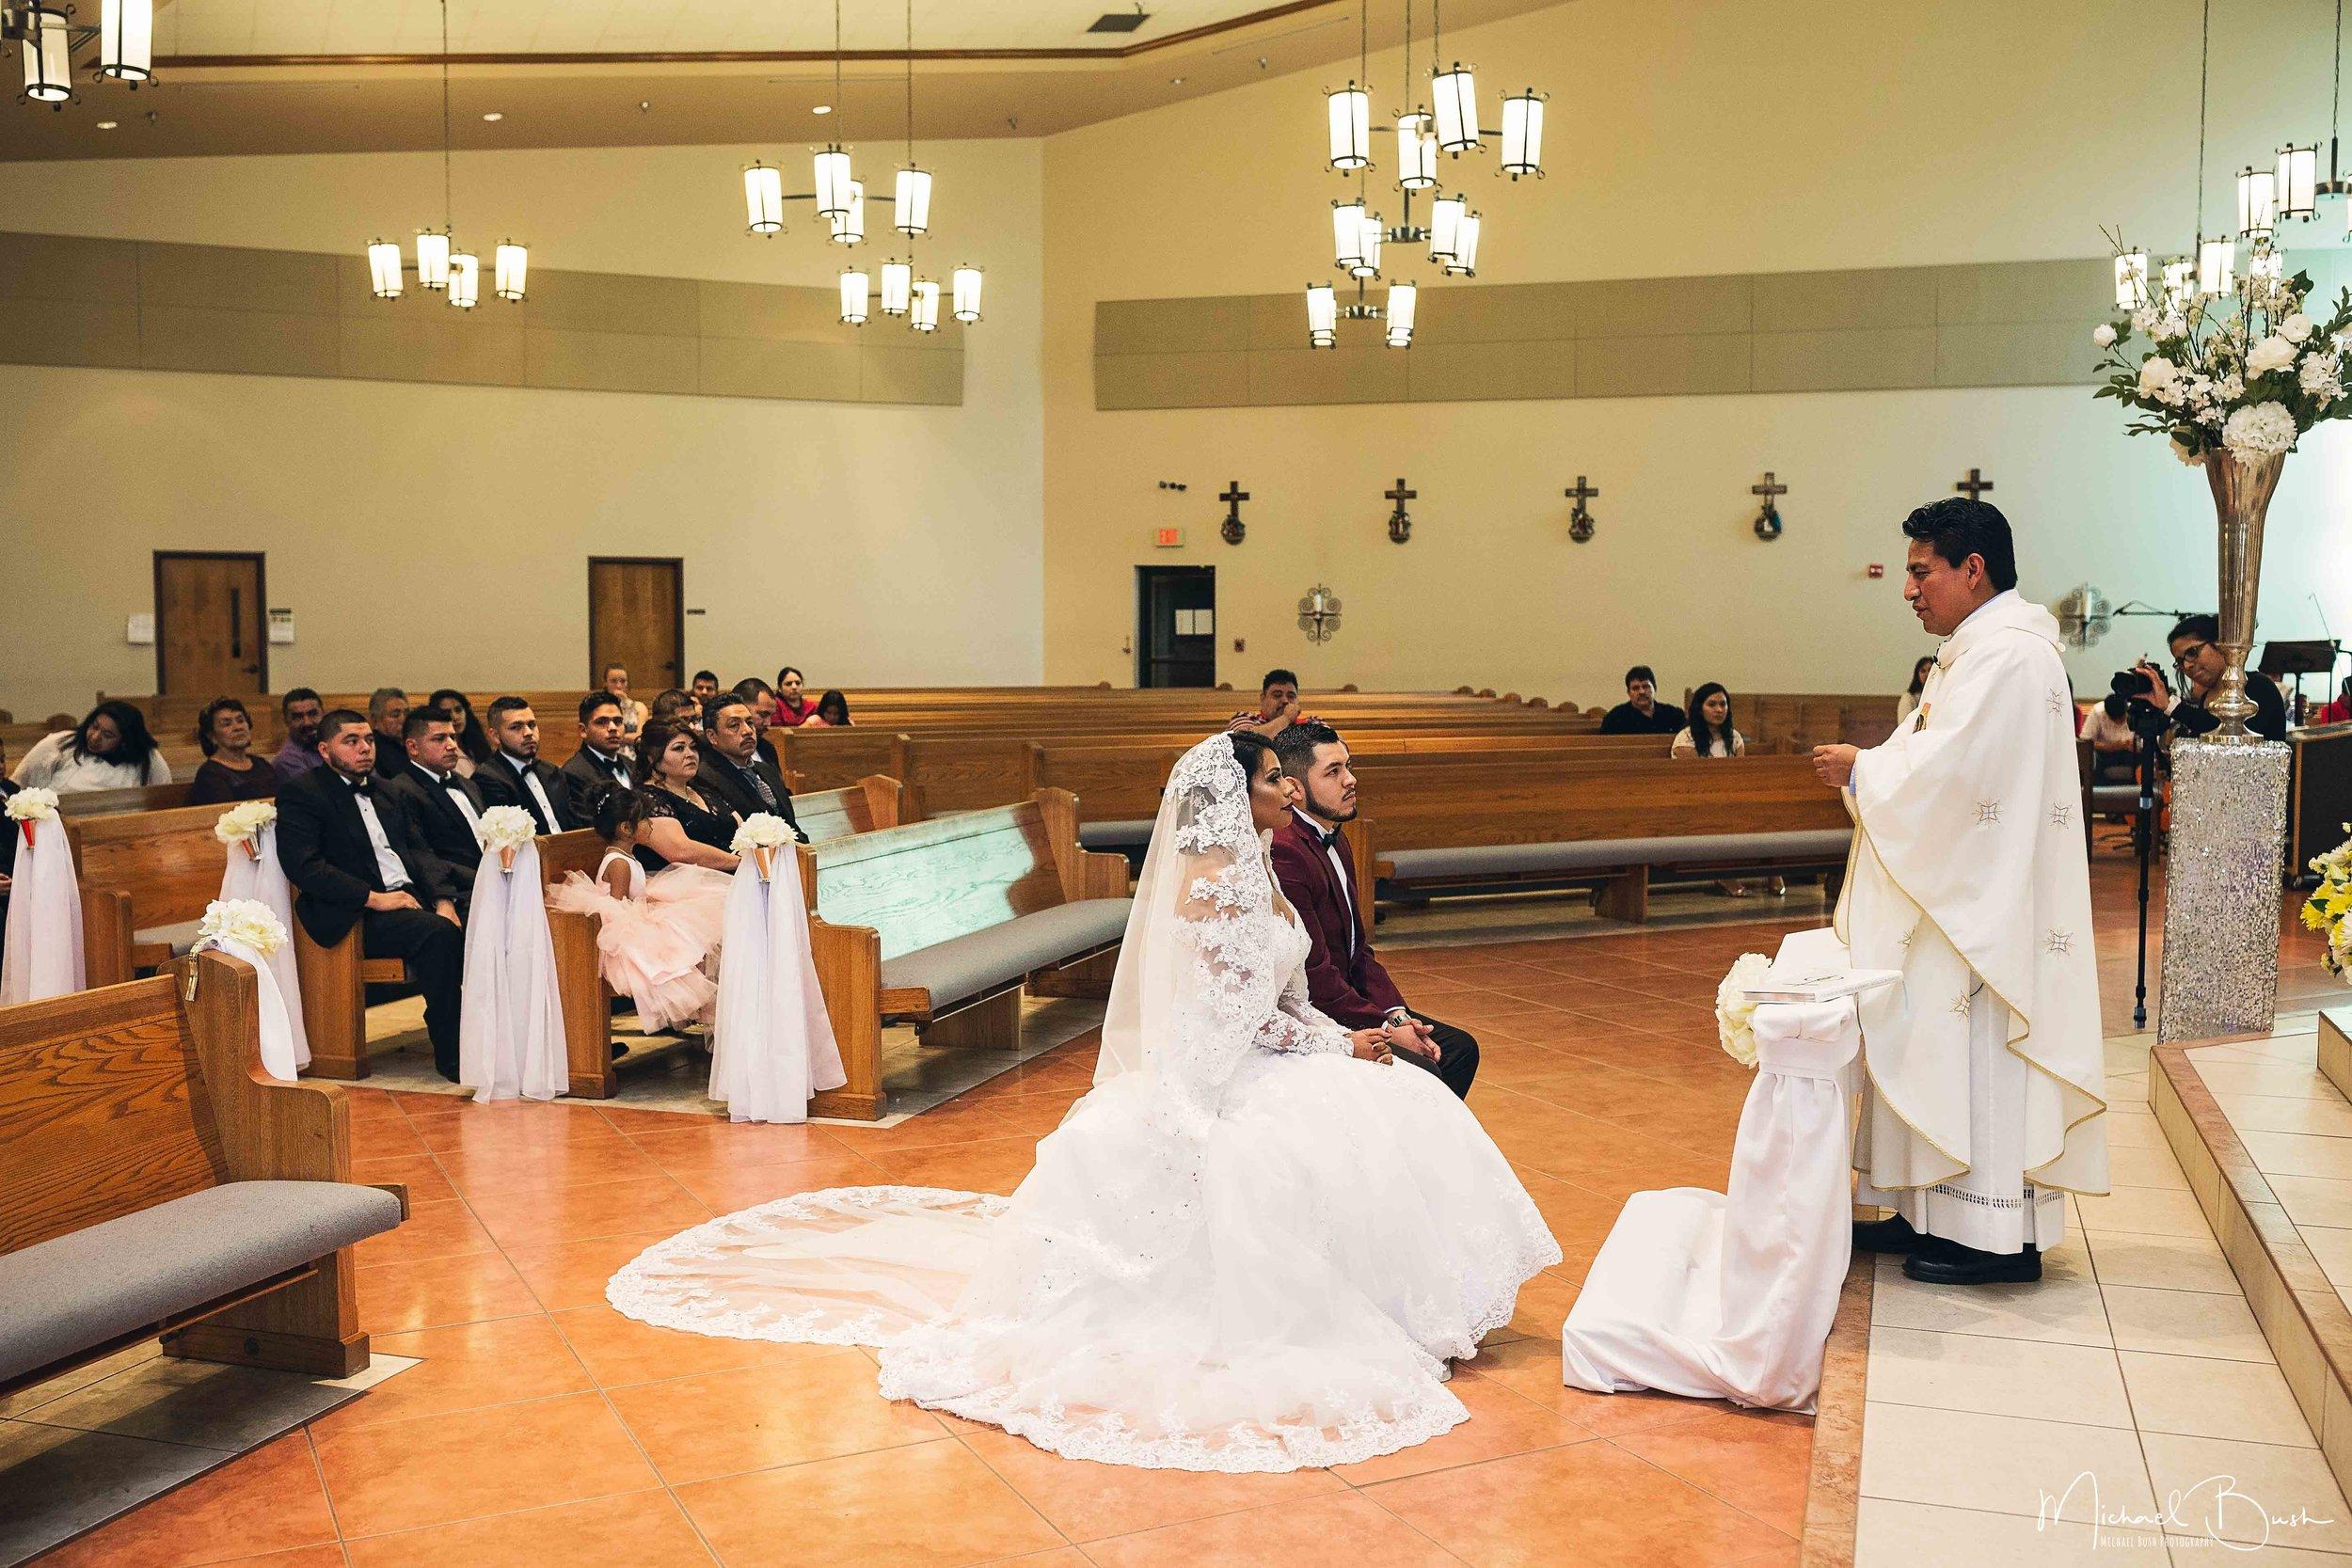 Wedding-Details-Bride-Fort Worth-colors-Ceremony-weddingceremony-brides-groom-ido-church.jpg